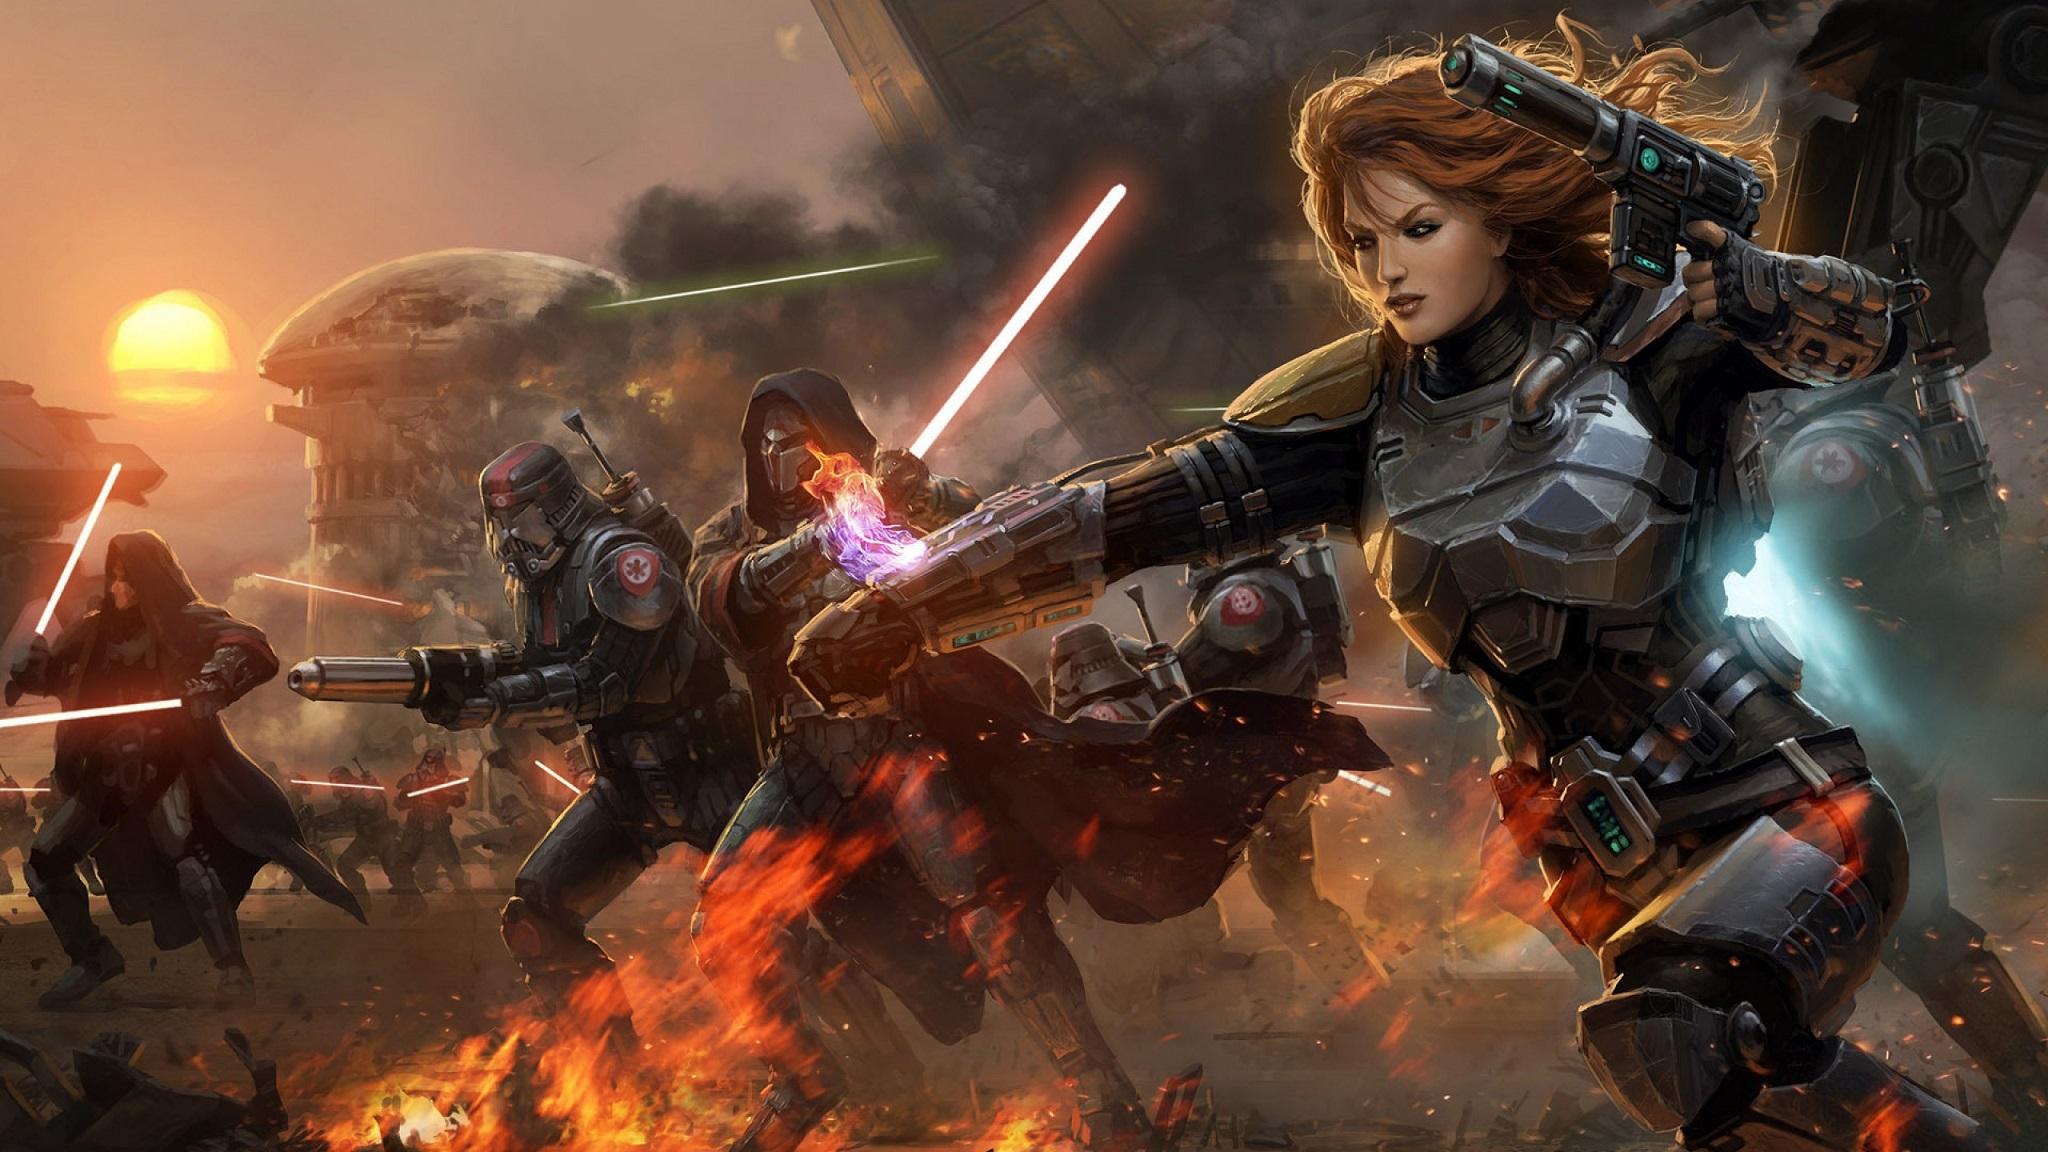 Star Wars The Old Republic Swtor Fondo De Pantalla Hd